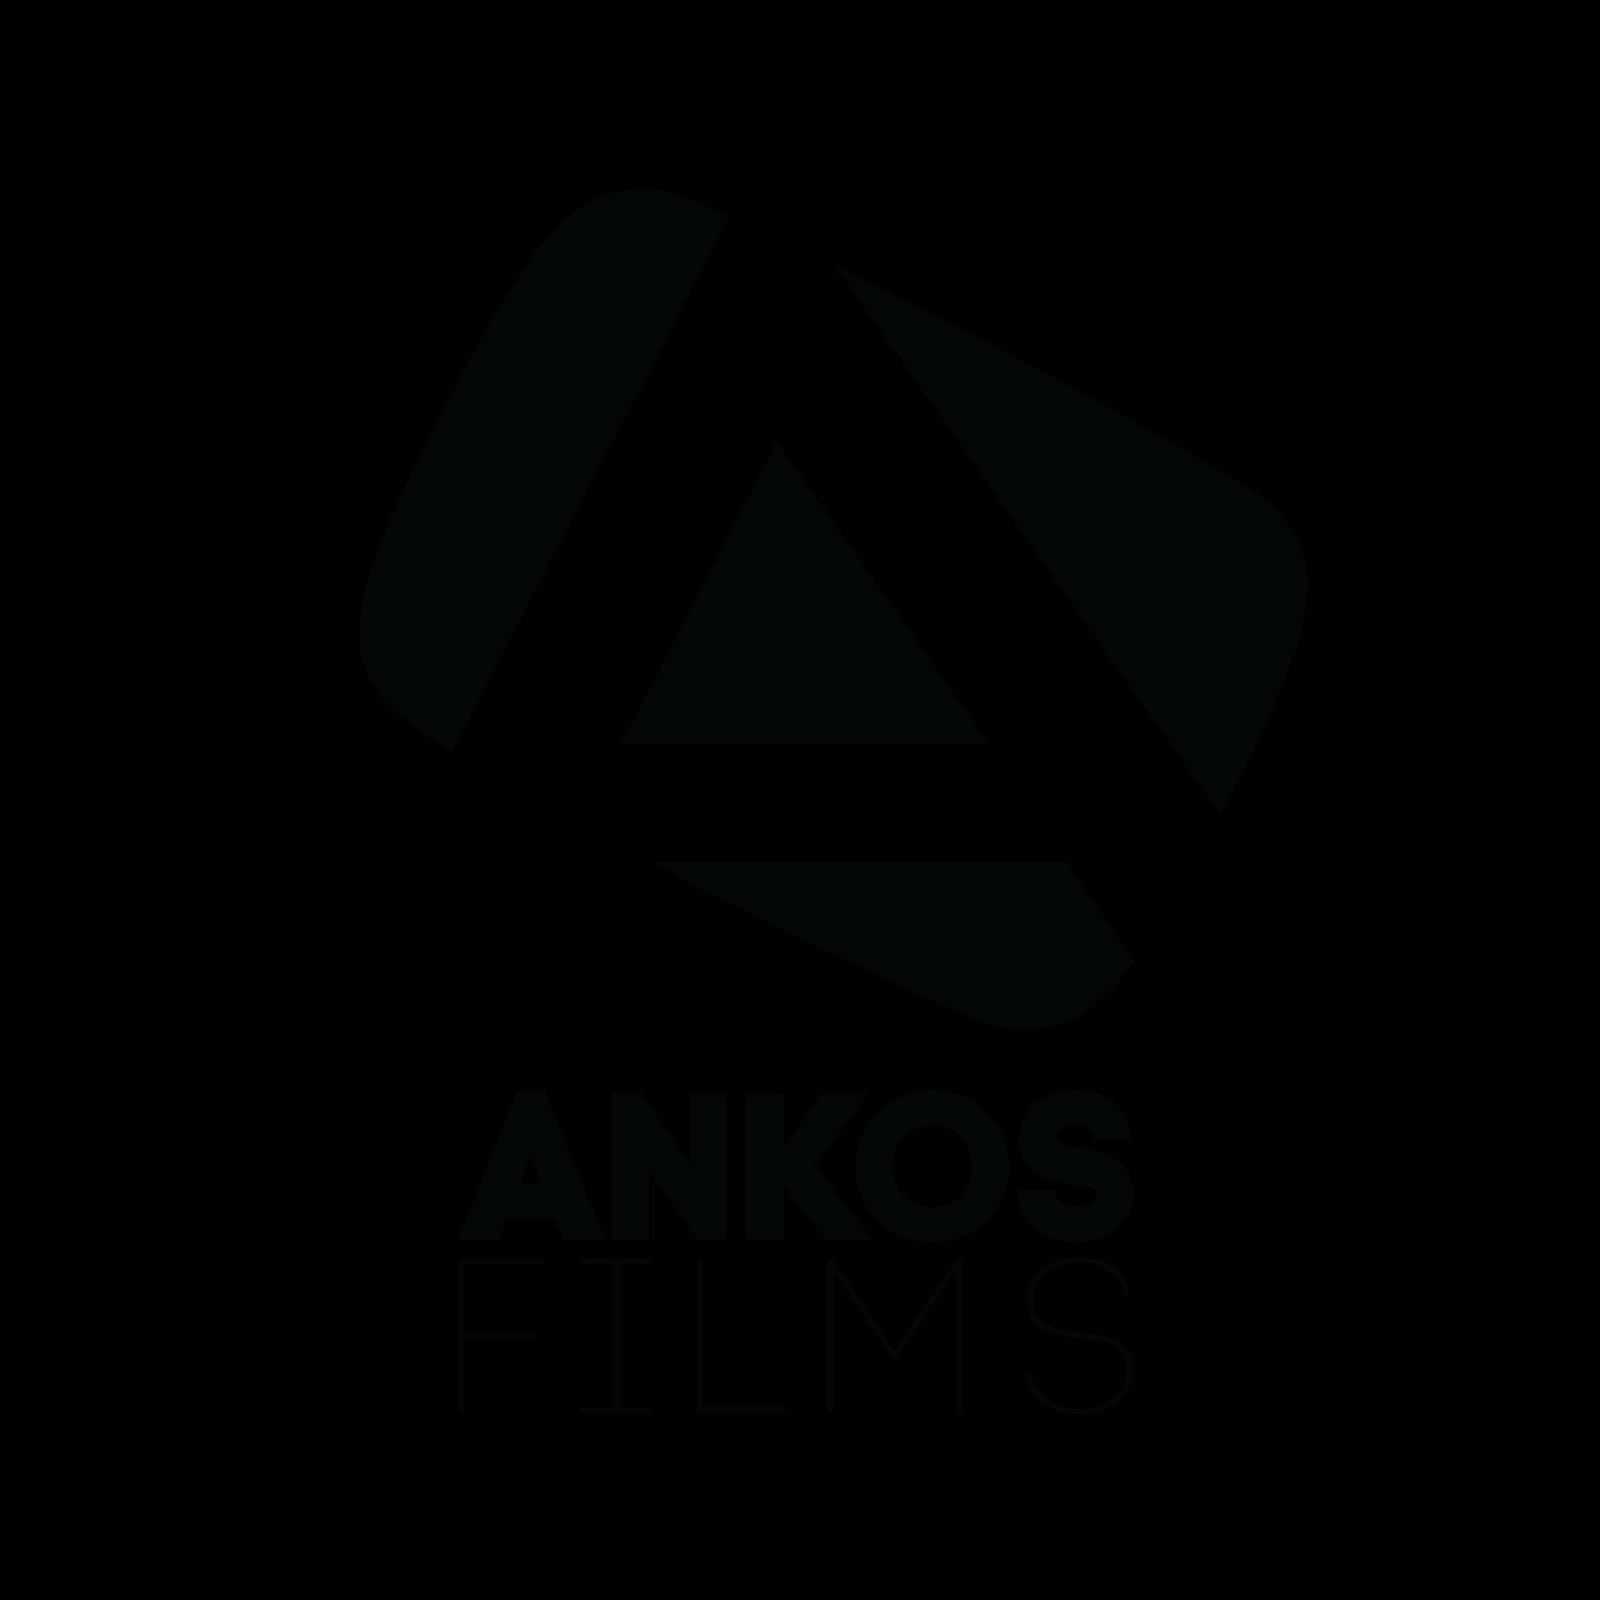 ANKOS Films